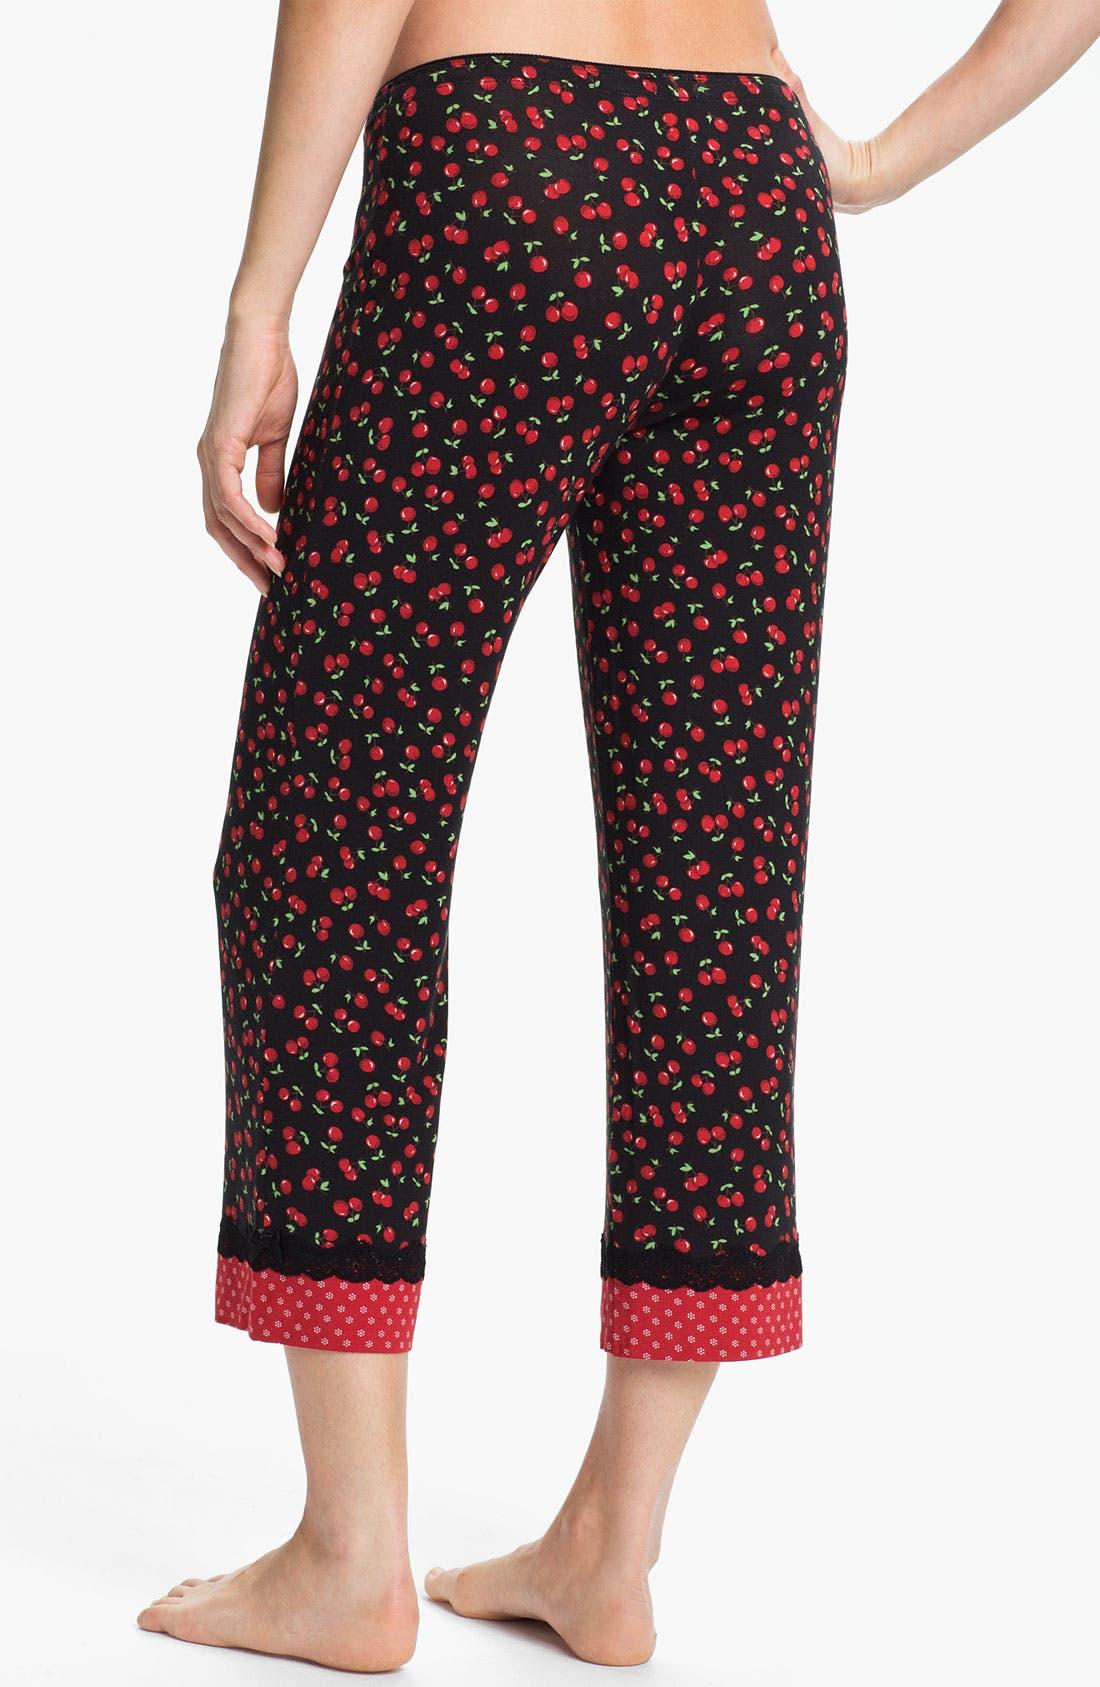 Alternate Image 2  - PJ Salvage 'Cherry Cherry' Knit Capri Pants